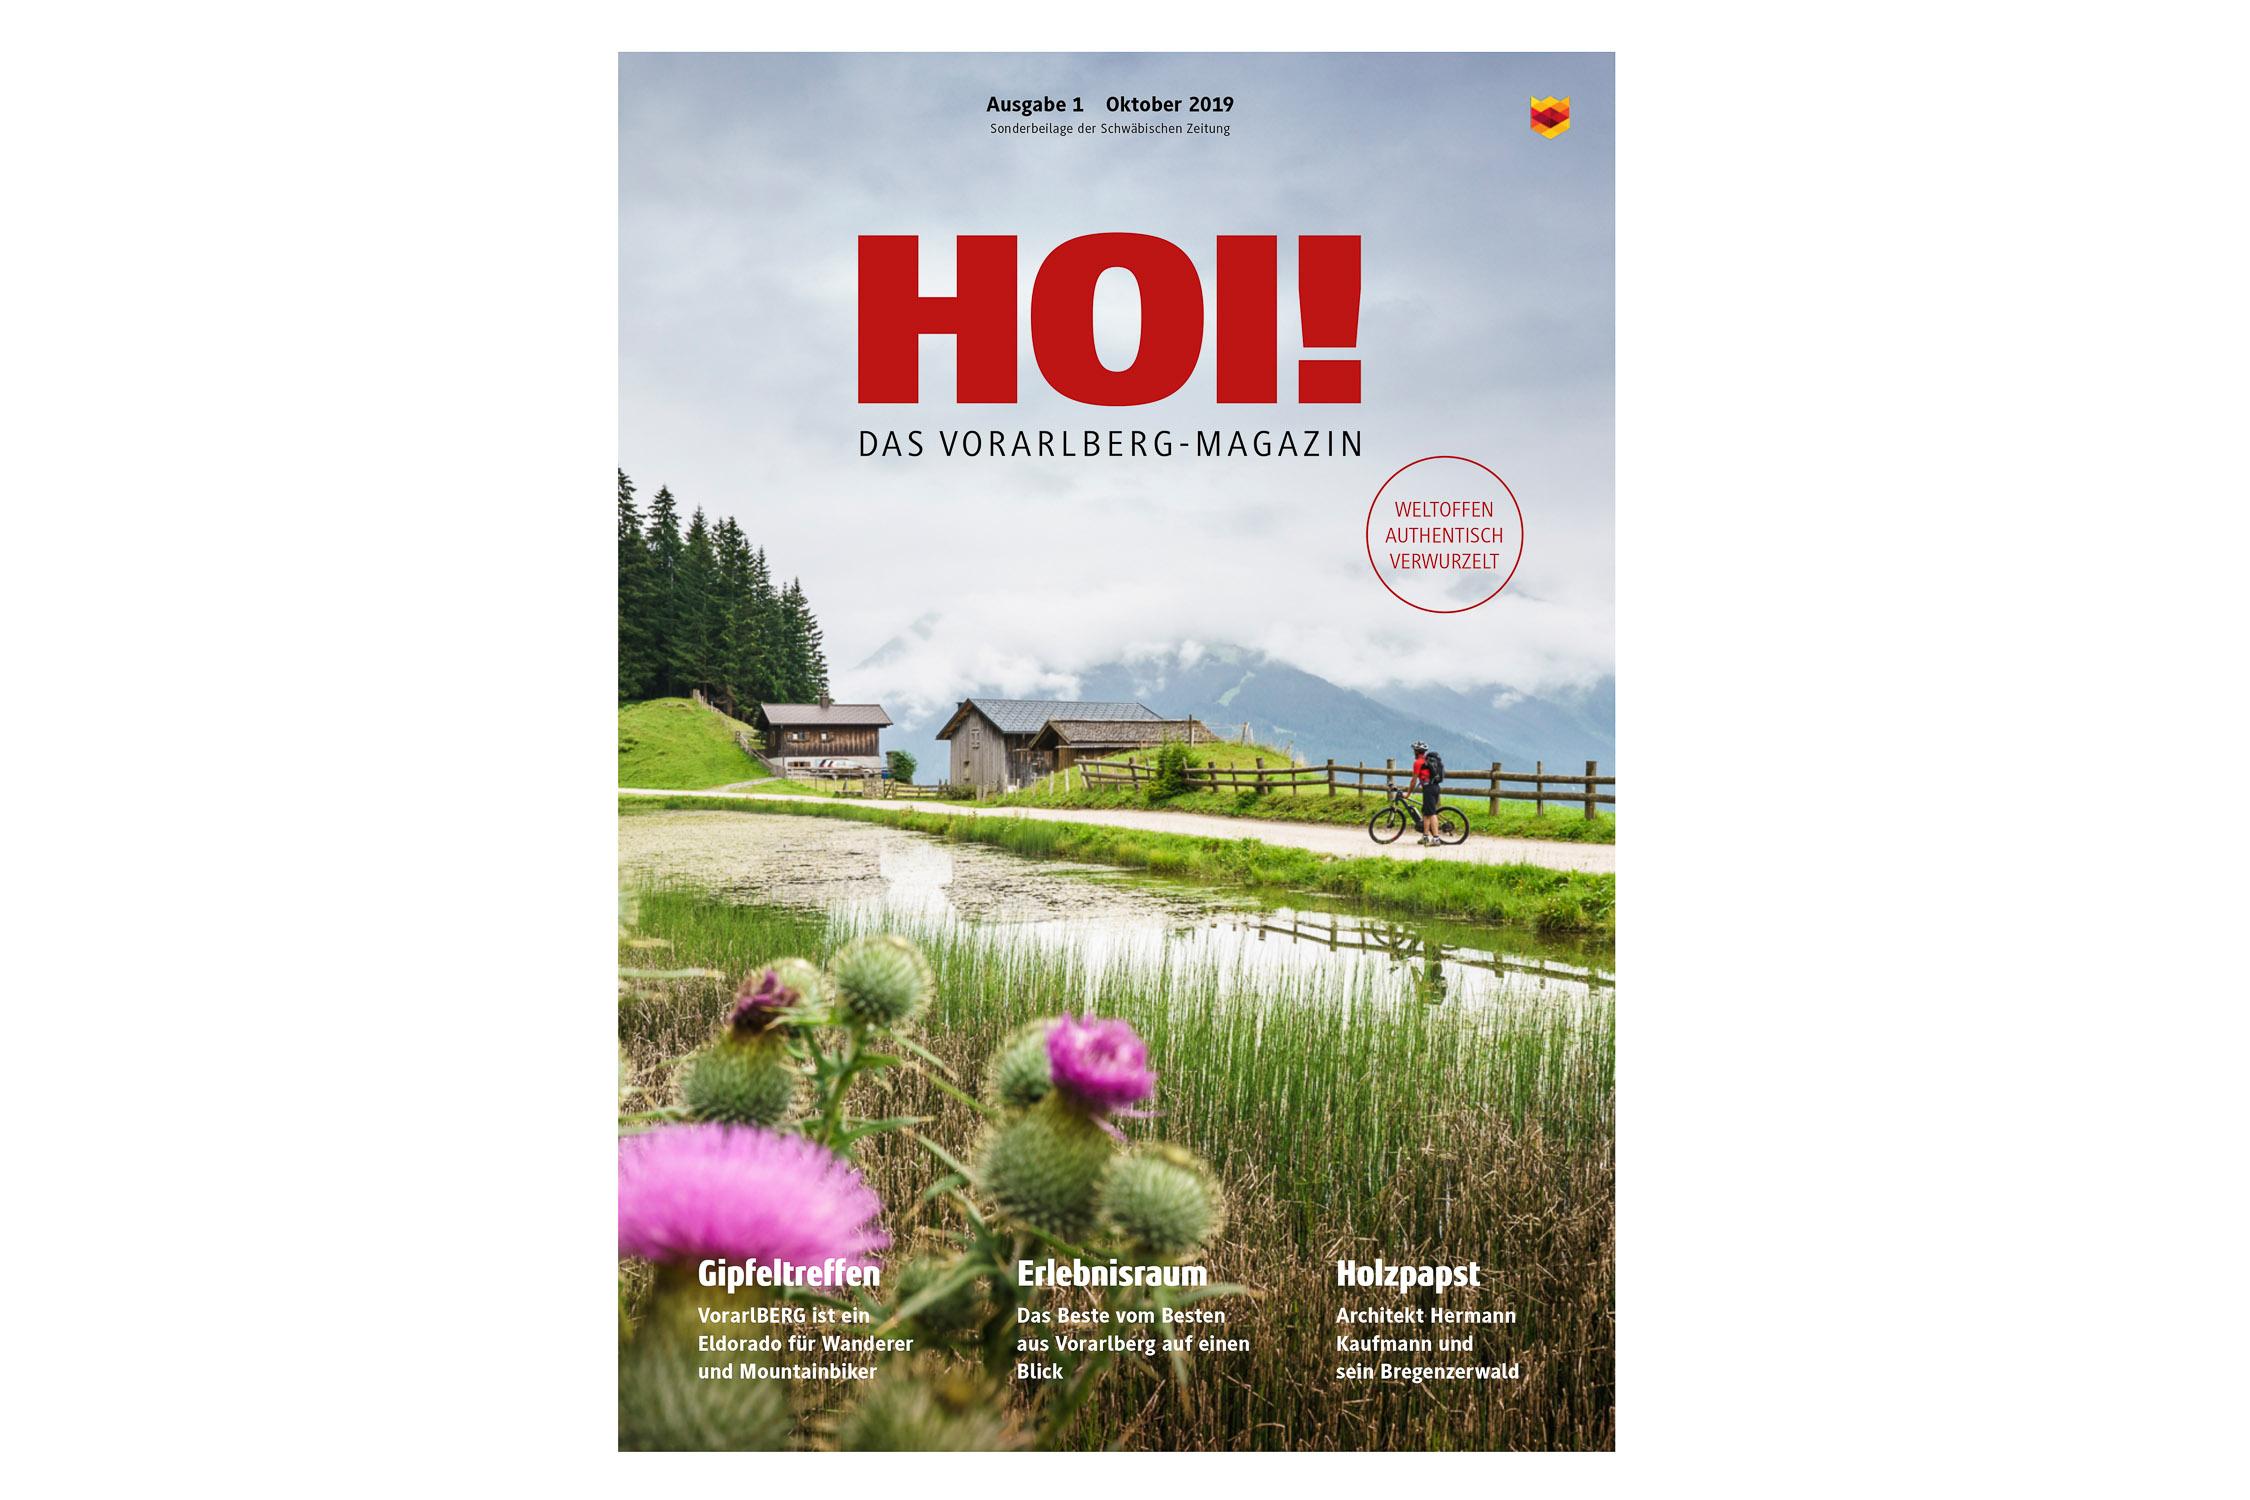 Referenz, Hoi, Das Vorarlberg Magazin, Lisa Dünser Fotografie